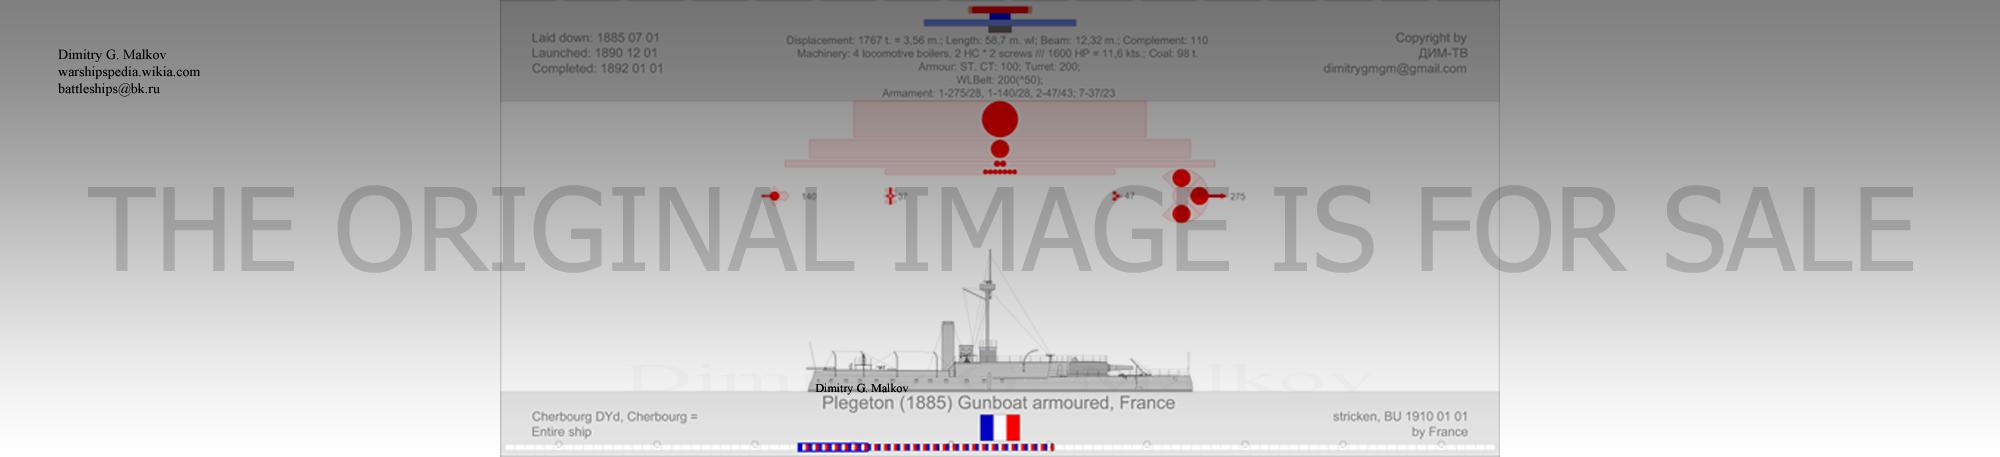 Mes dessins des navires francais - Page 9 Ga-18812